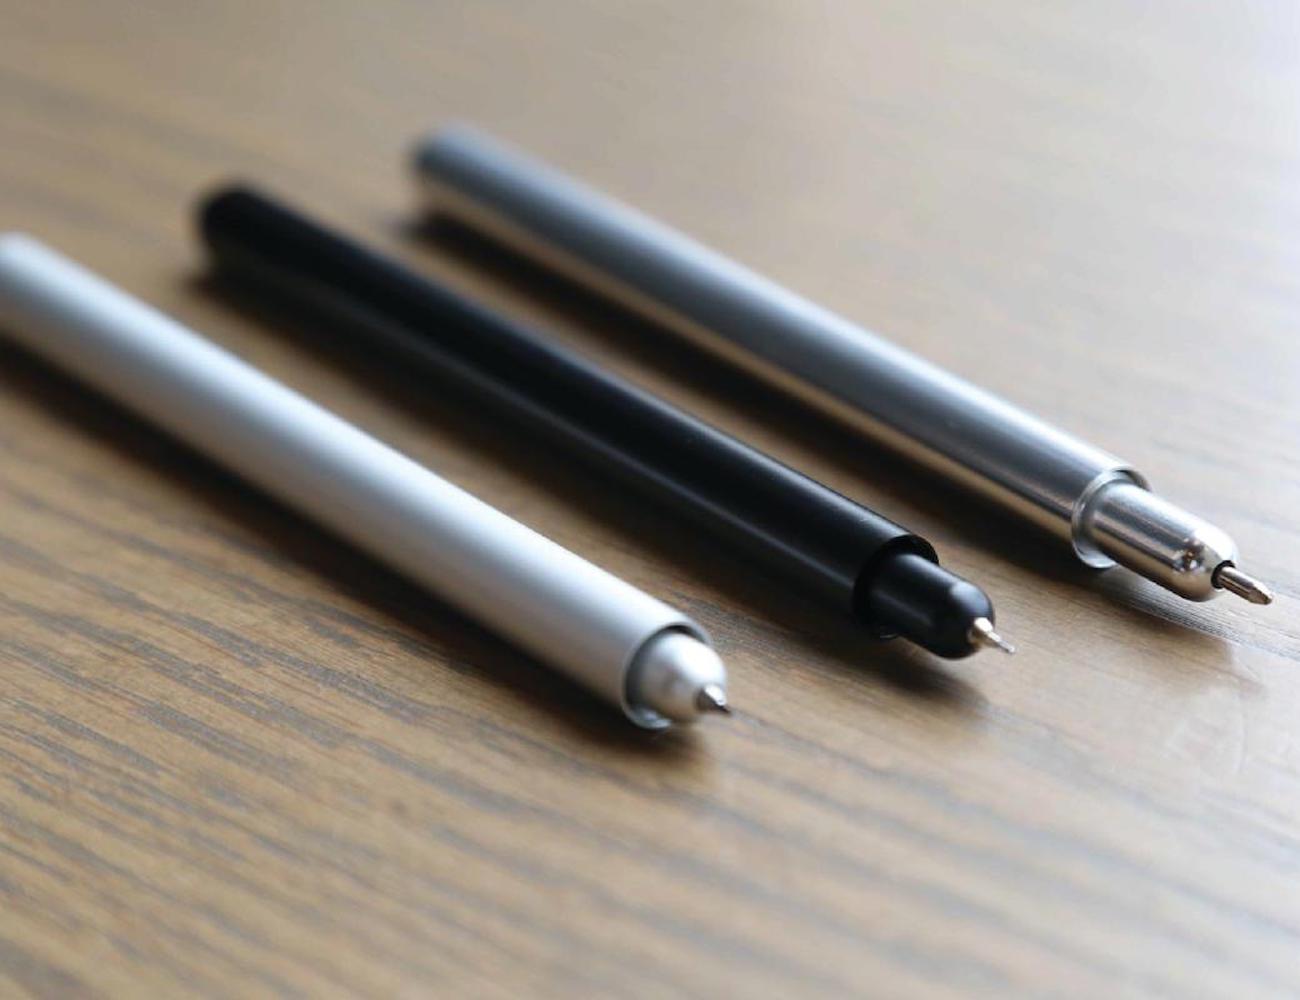 TAKUMI PURE+ An Elegant yet Smart/ Versatile Stationery